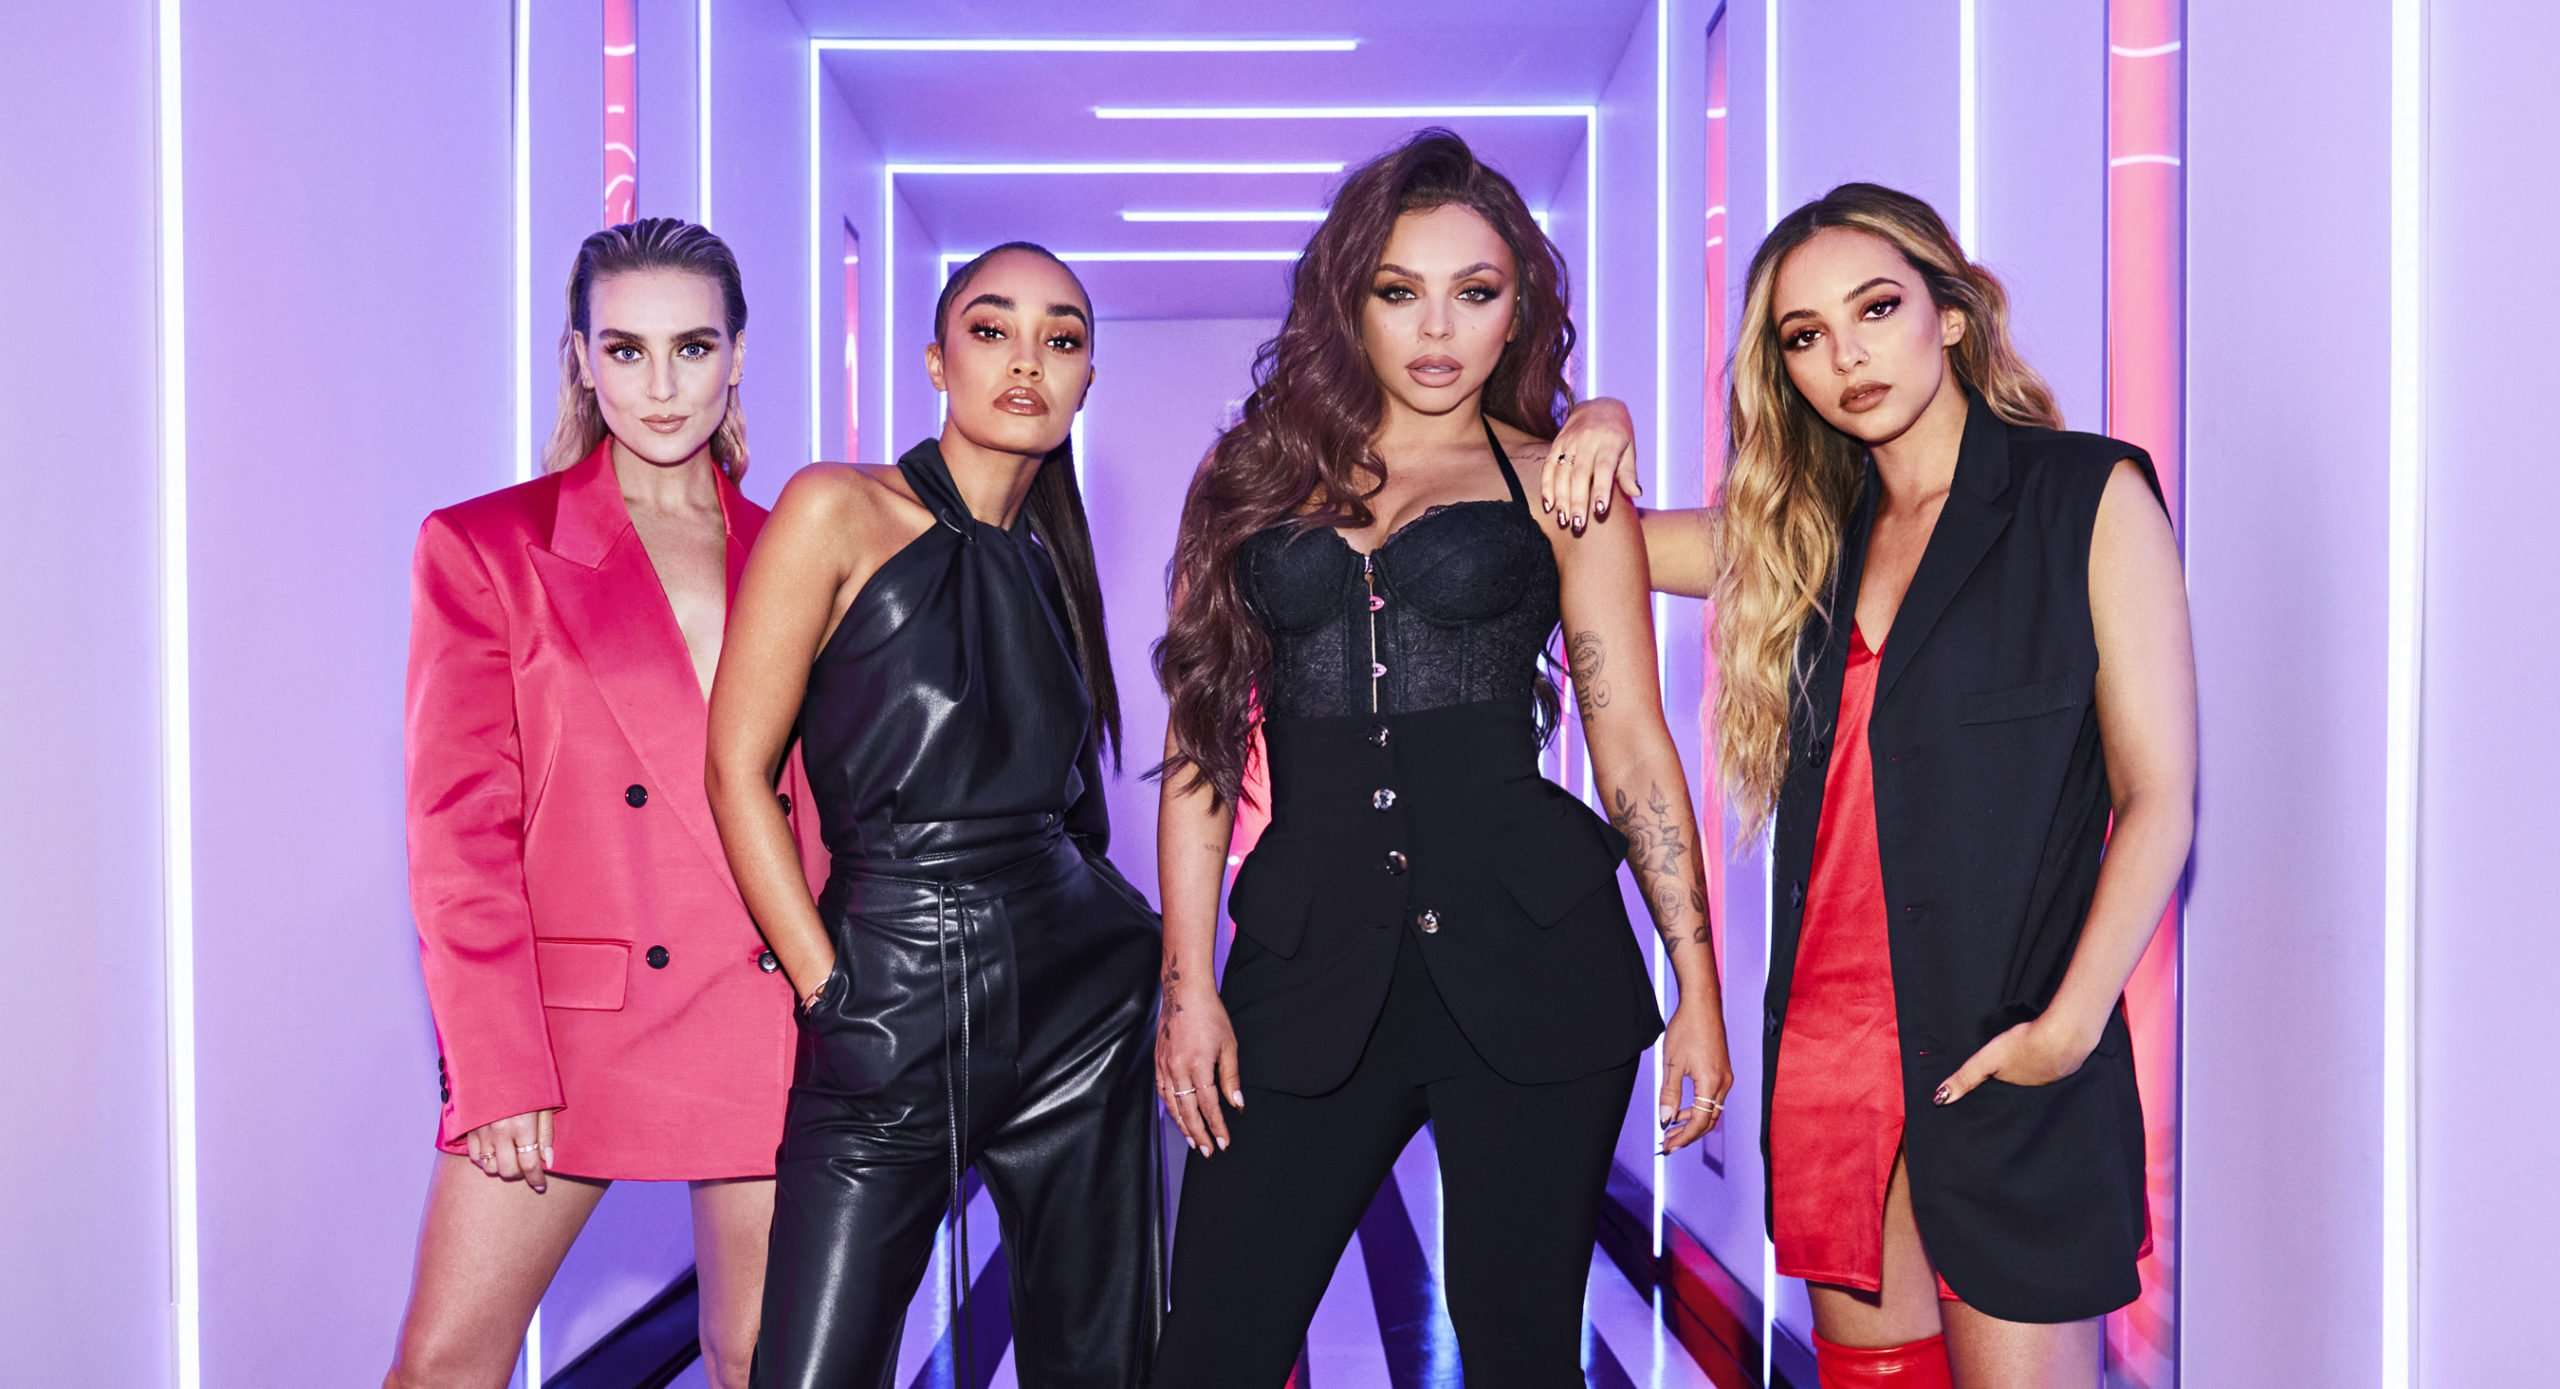 Little Mix anuncia que Jesy Nelson abandona el grupo por razones médicas